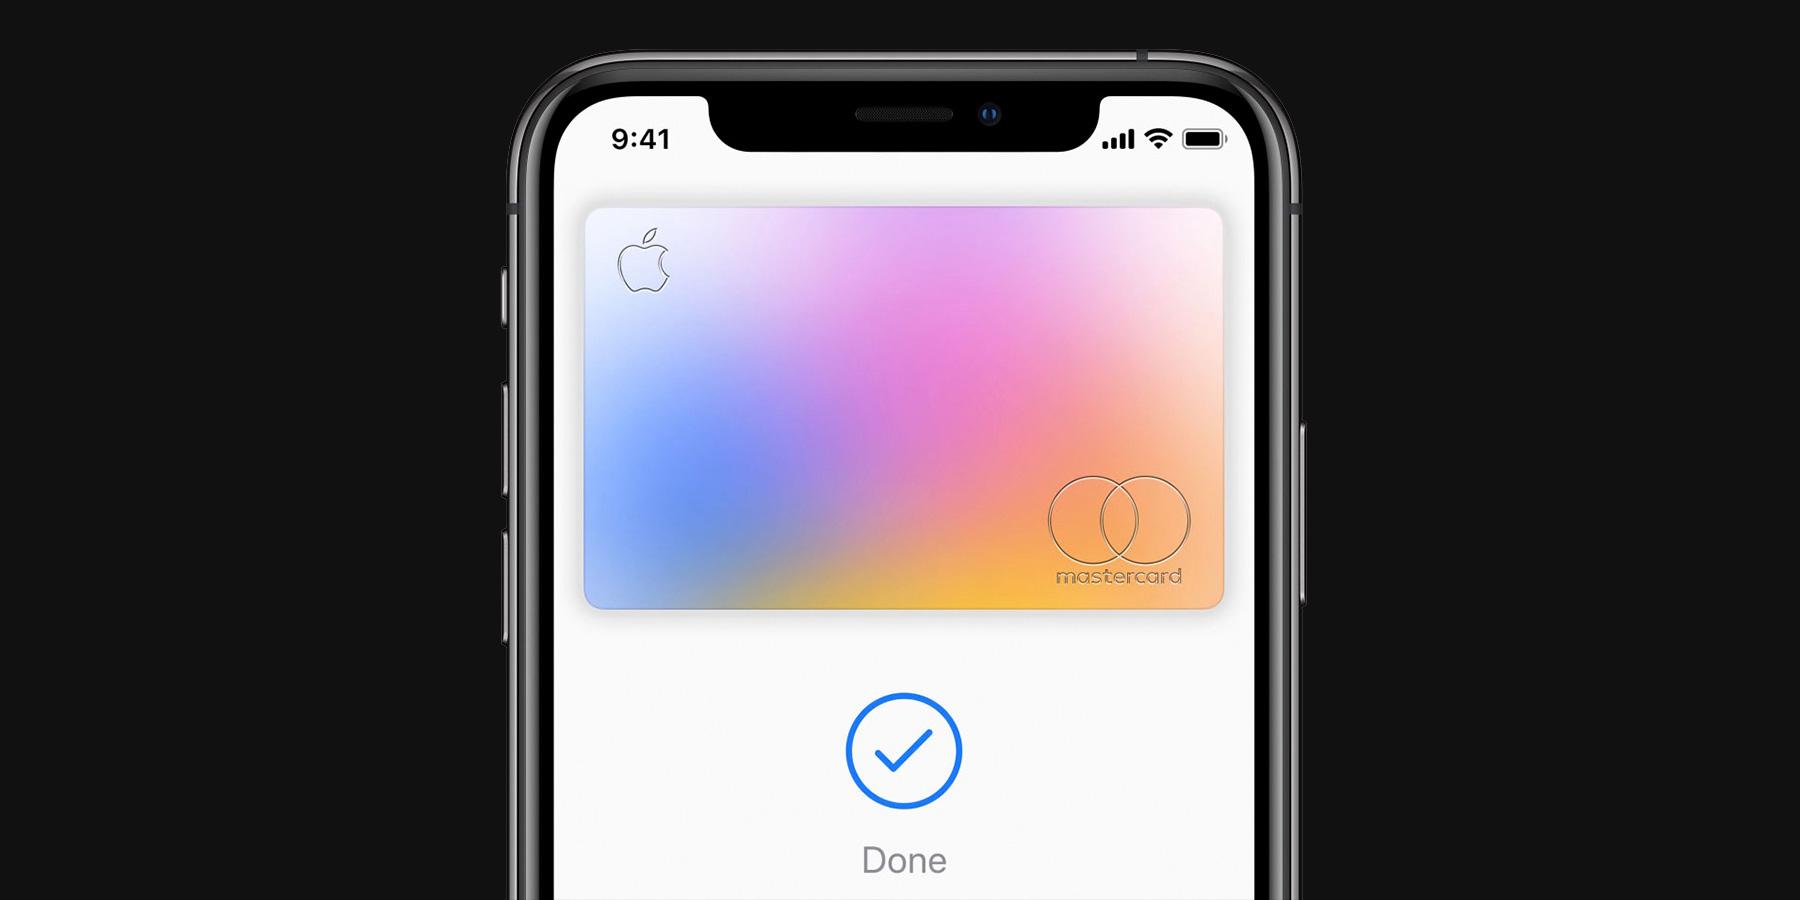 蘋果 Apple Card意味著什么?蘋果 Apple Card事件始末